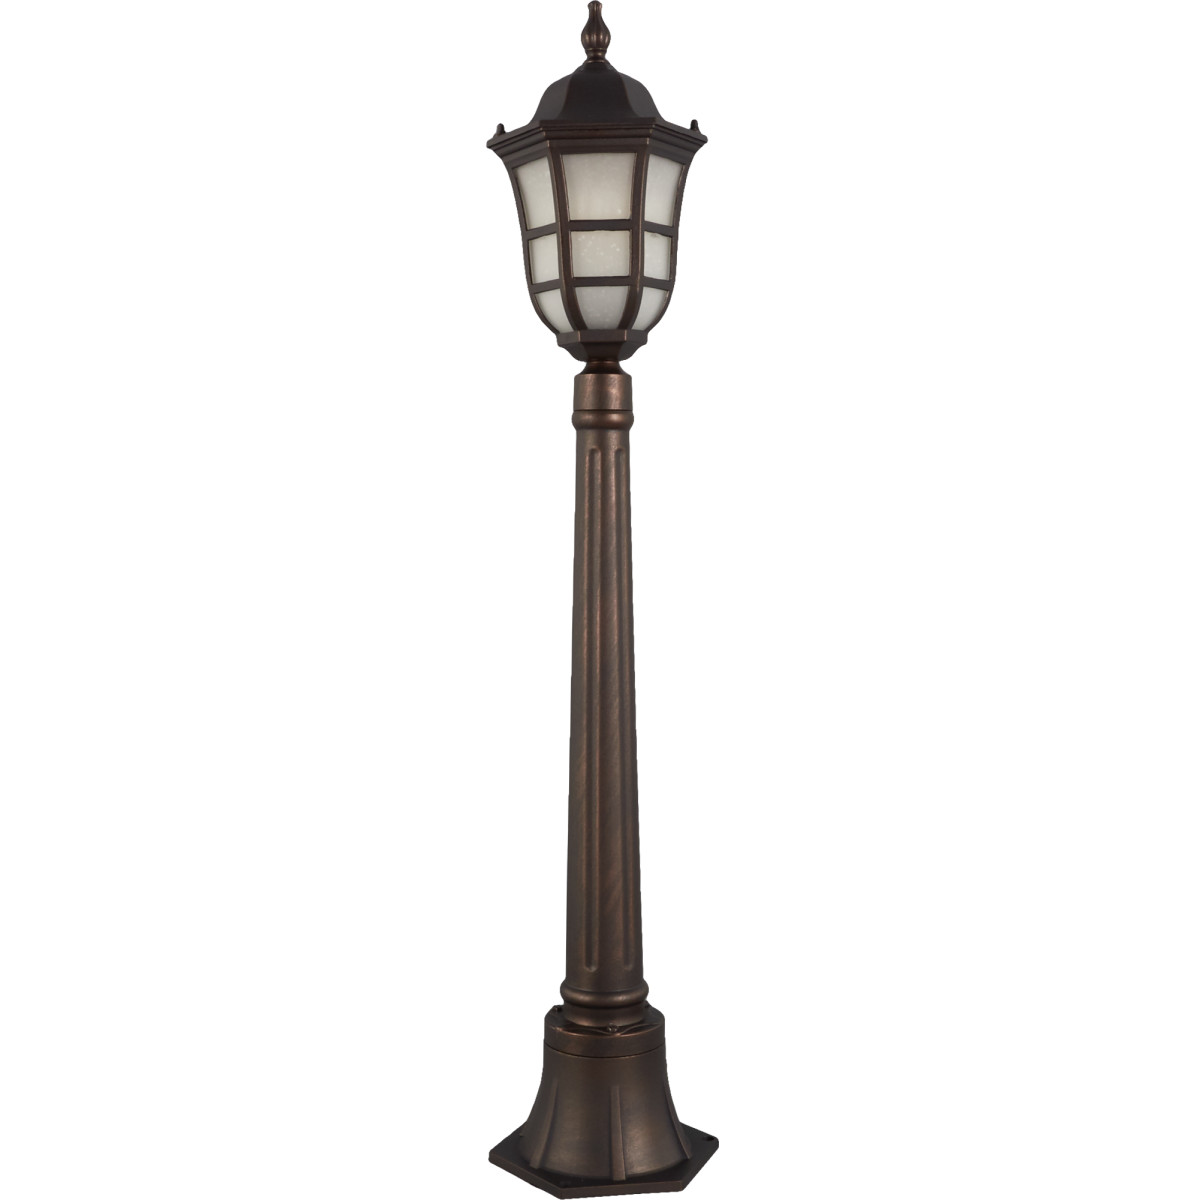 Столб уличный Меридиан 105 см